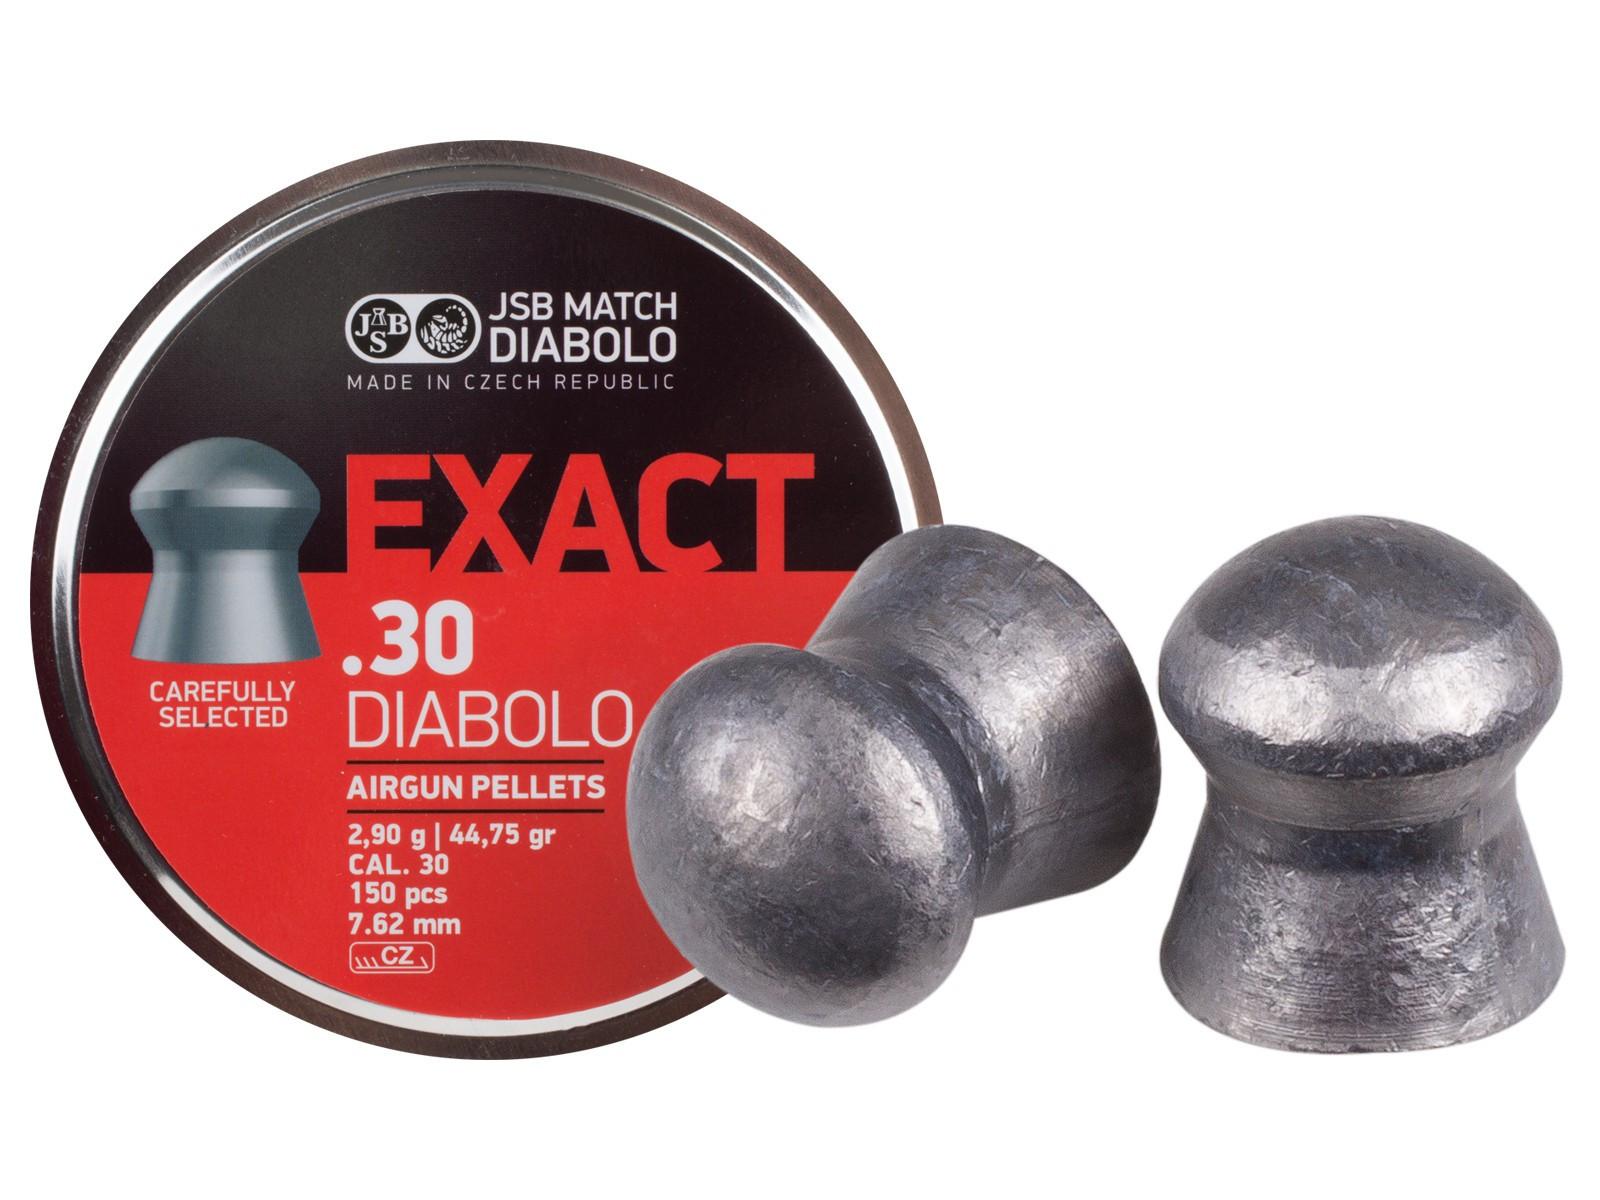 JSB Diabolo Exact .30 Cal, 44.75 gr - 150 ct